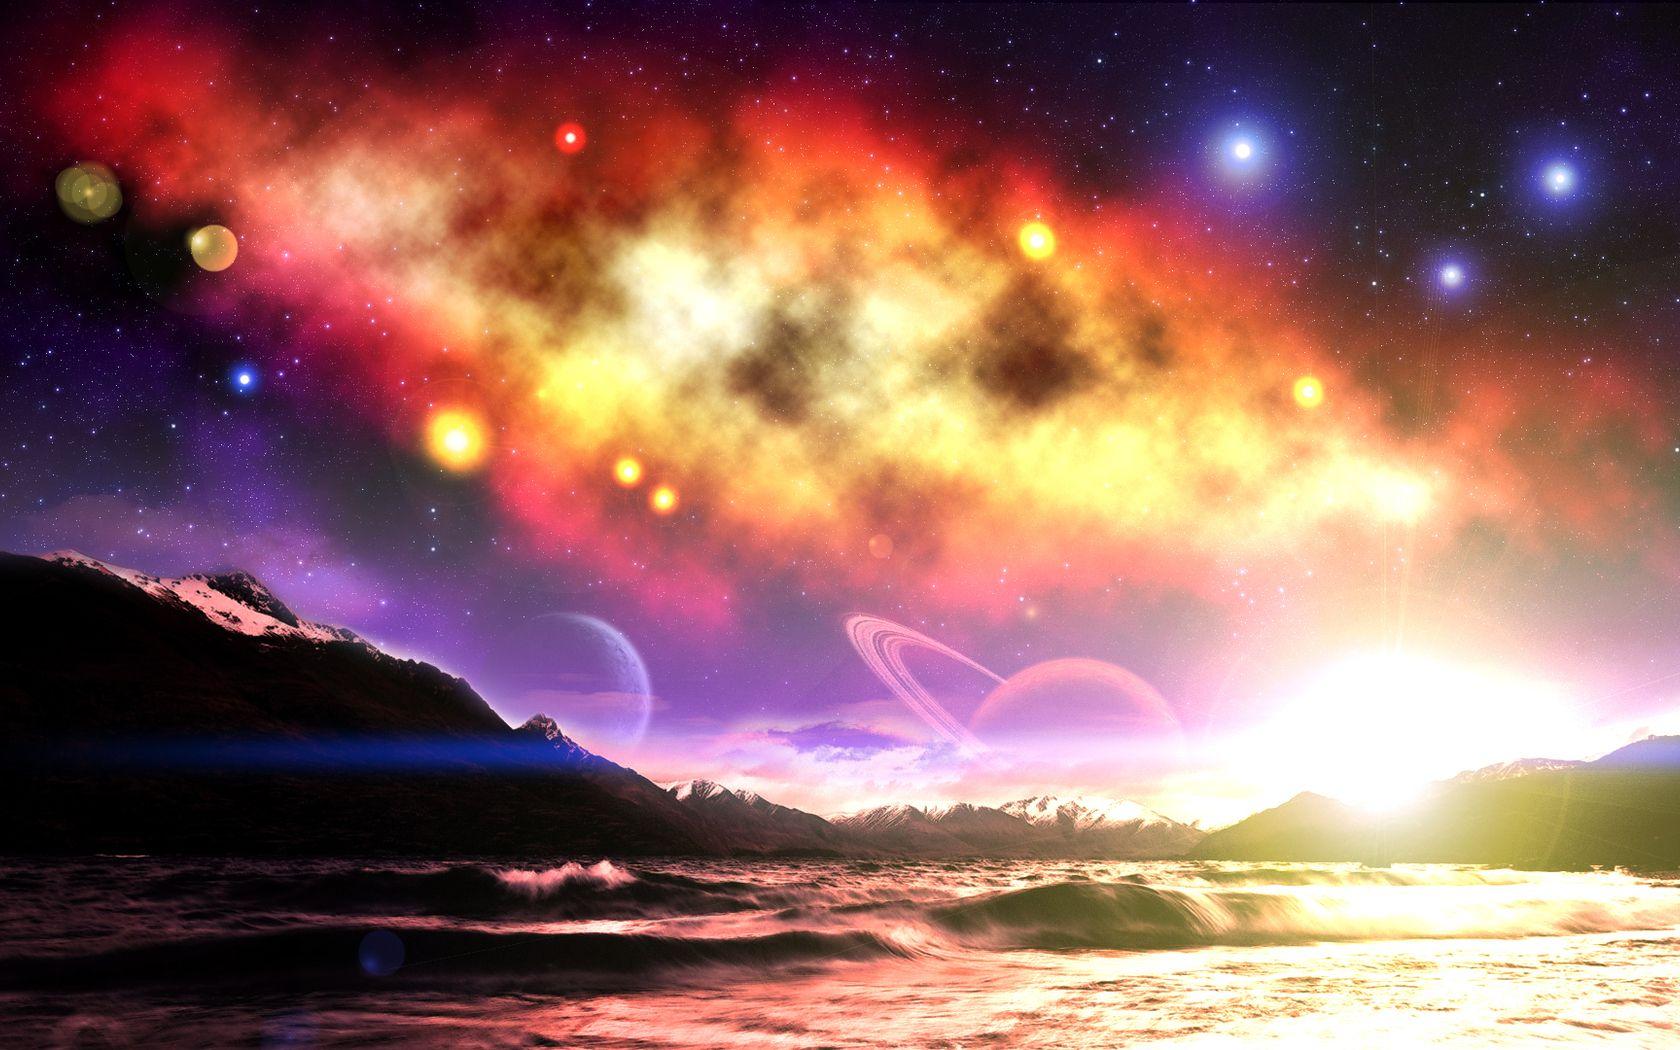 Psychedelic Computer Wallpapers Desktop Backgrounds 1680x1050 Id 304006 Space Art Wallpaper Space Art Sunrise Wallpaper